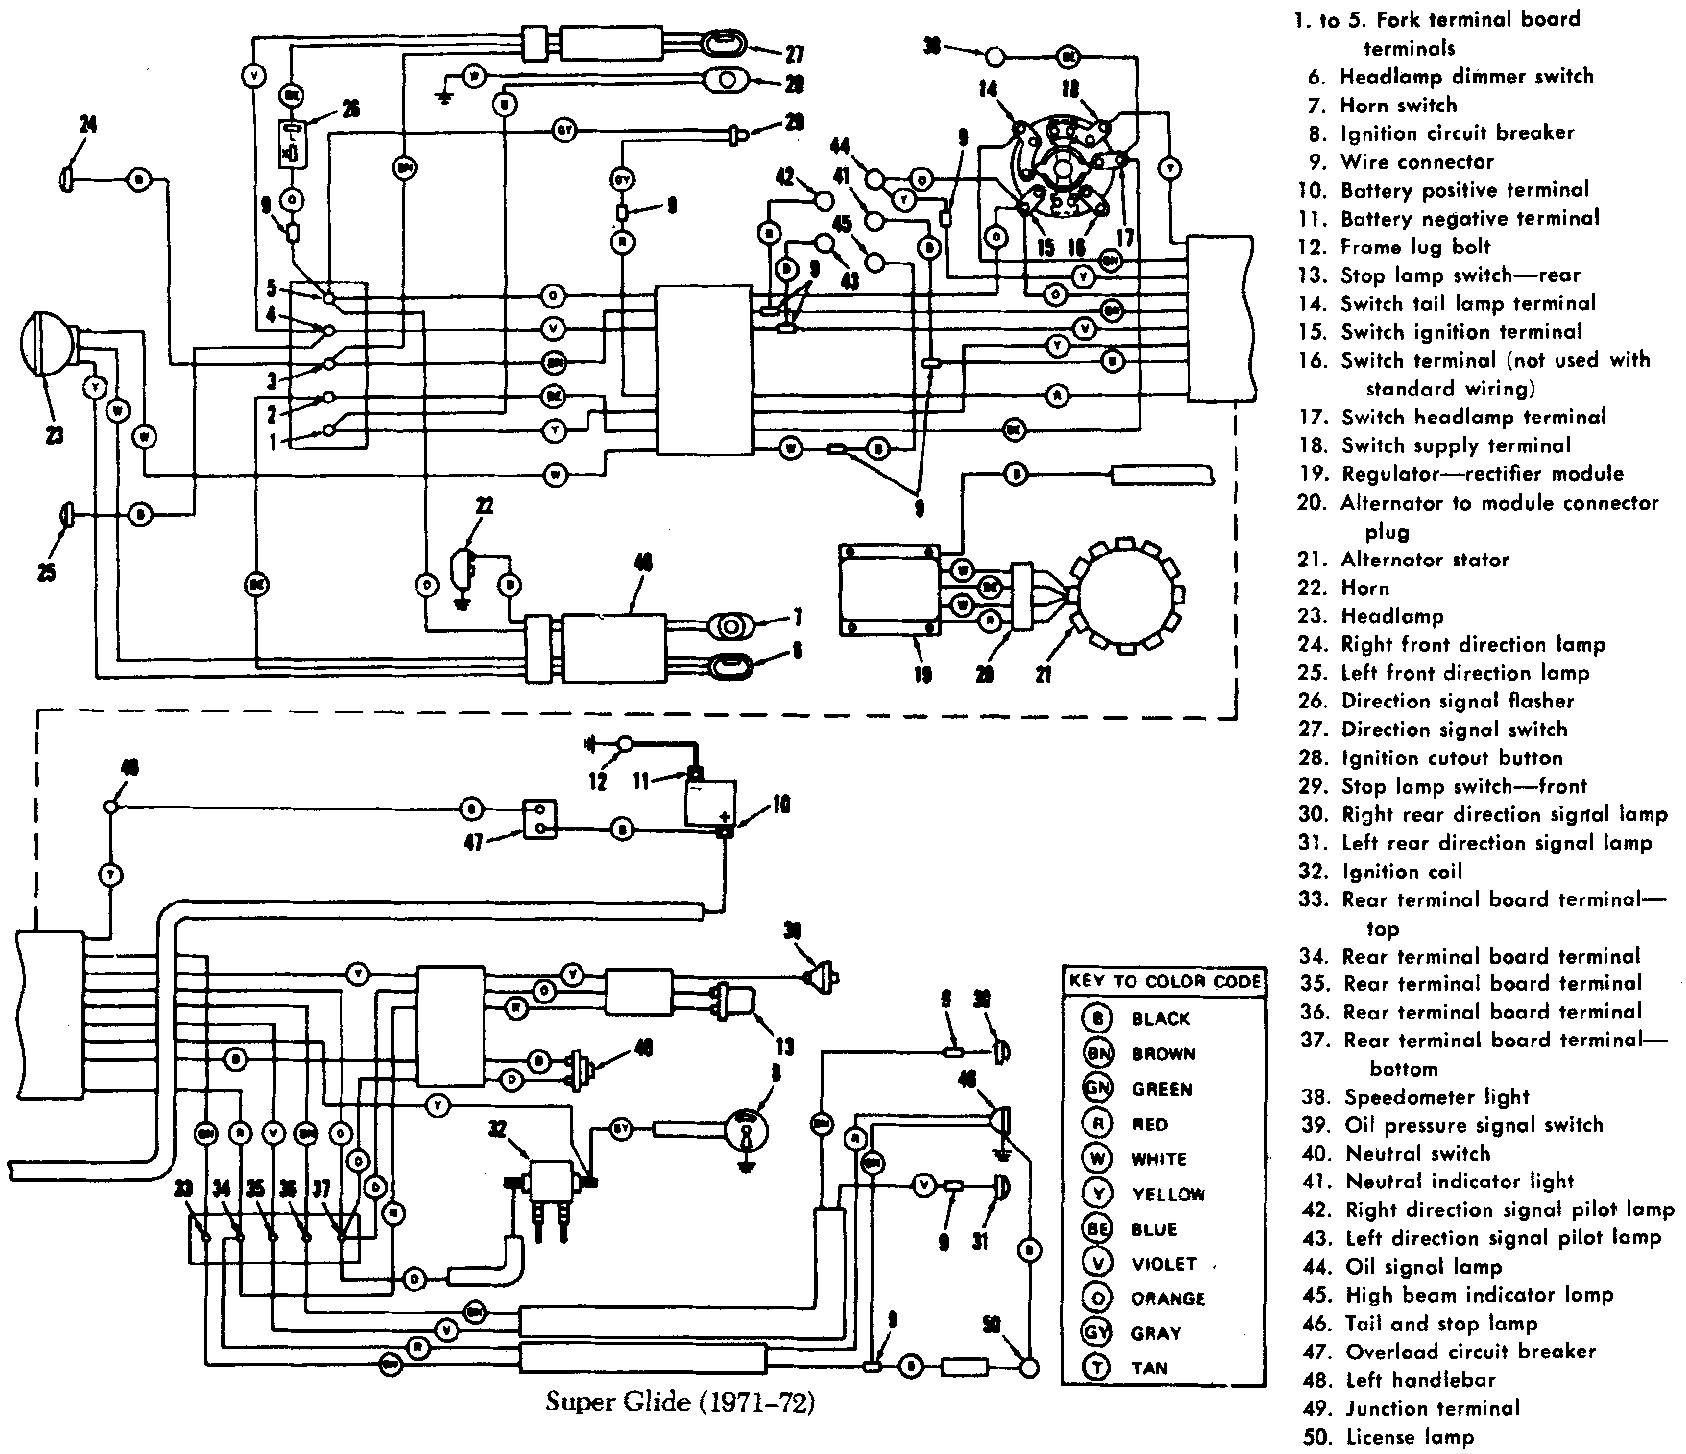 1981 fxwg wiring diagram